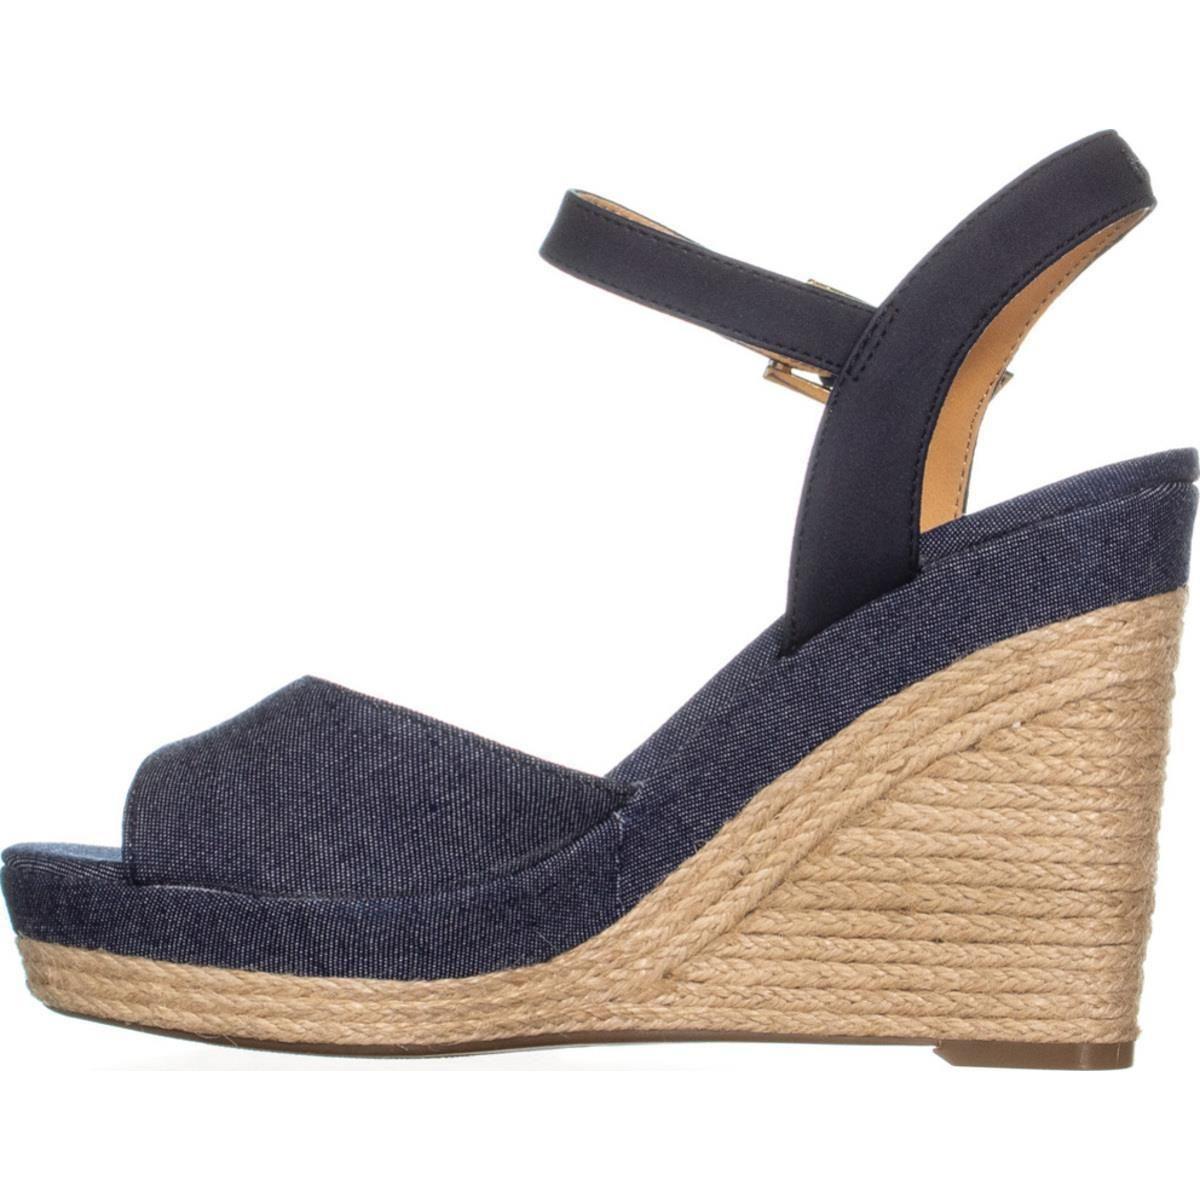 322c6465 Lyst - Tommy Hilfiger Kali Peep Toe Wedge Sandals in Blue